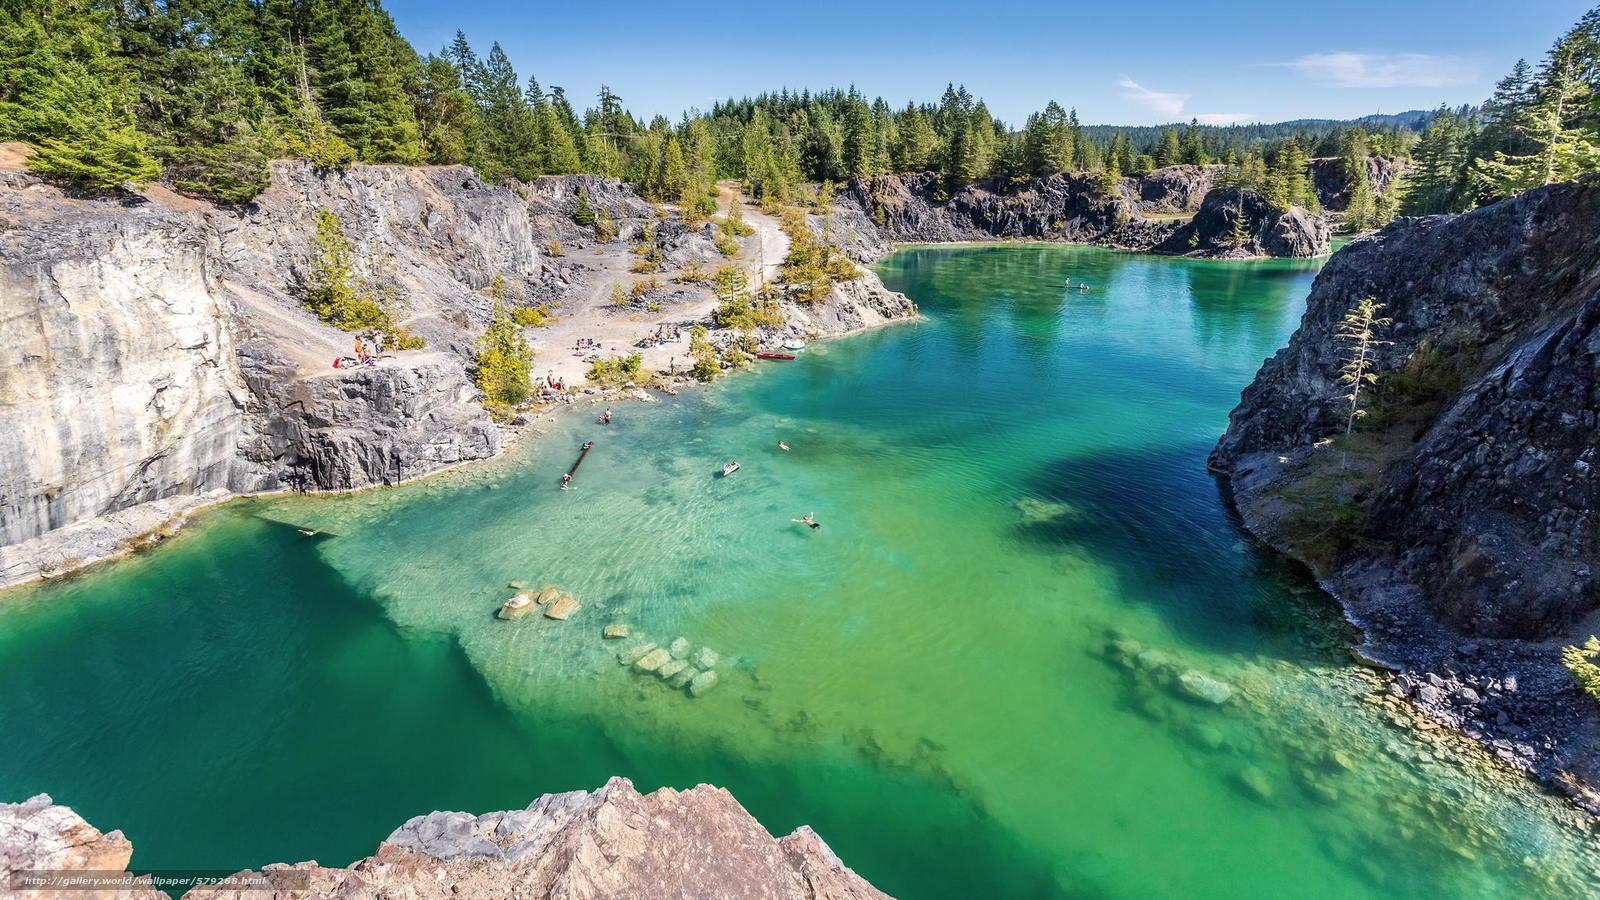 Descargar gratis río,  lago,  naturaleza,  bosque Fondos de escritorio en la resolucin 2048x1152 — imagen №579268